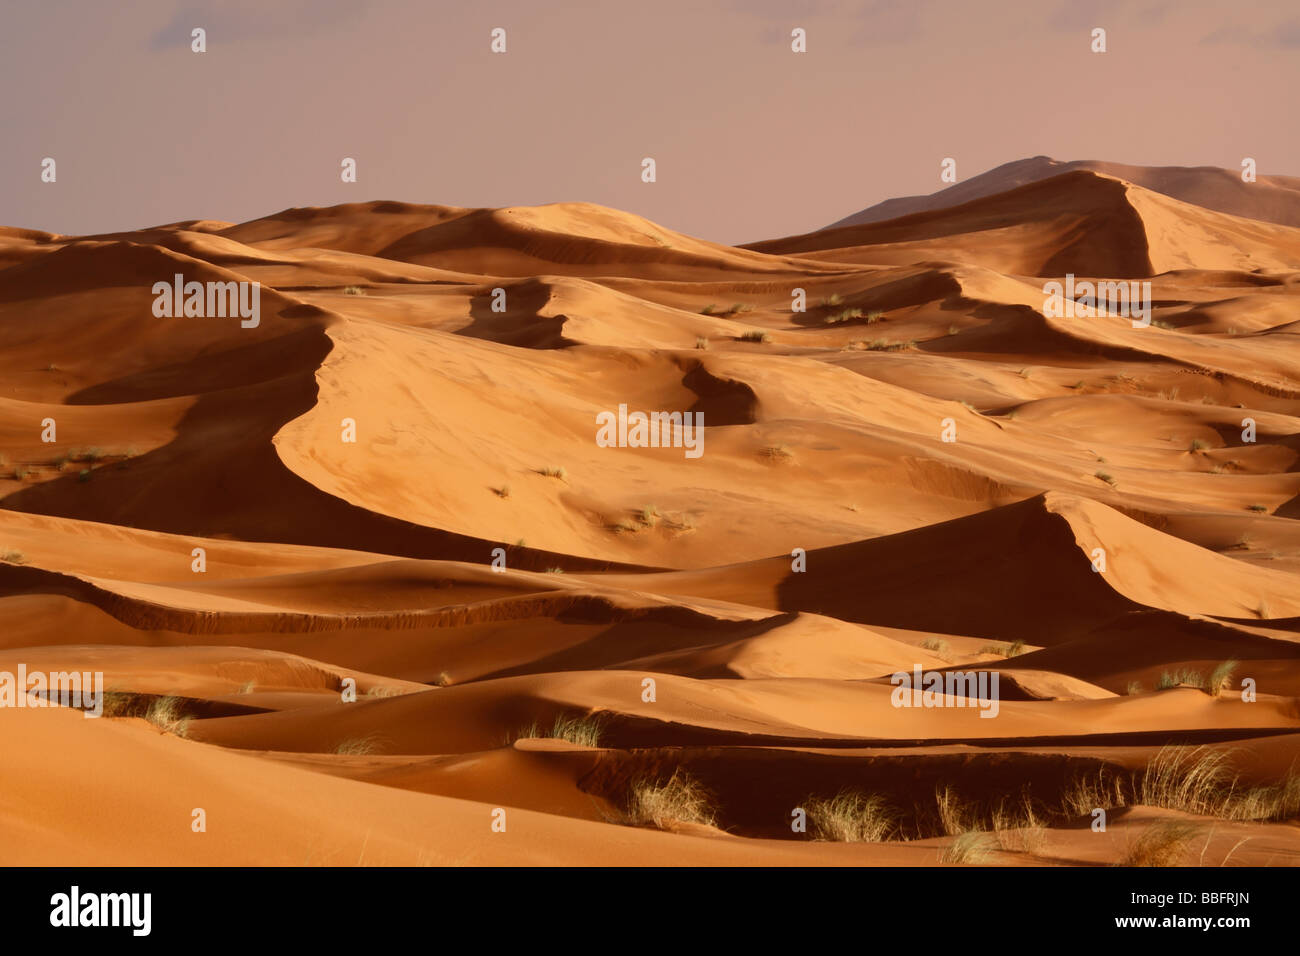 Africa, North Africa, Morocco, Sahara Desert, Merzouga, Erg Chebbi - Stock Image